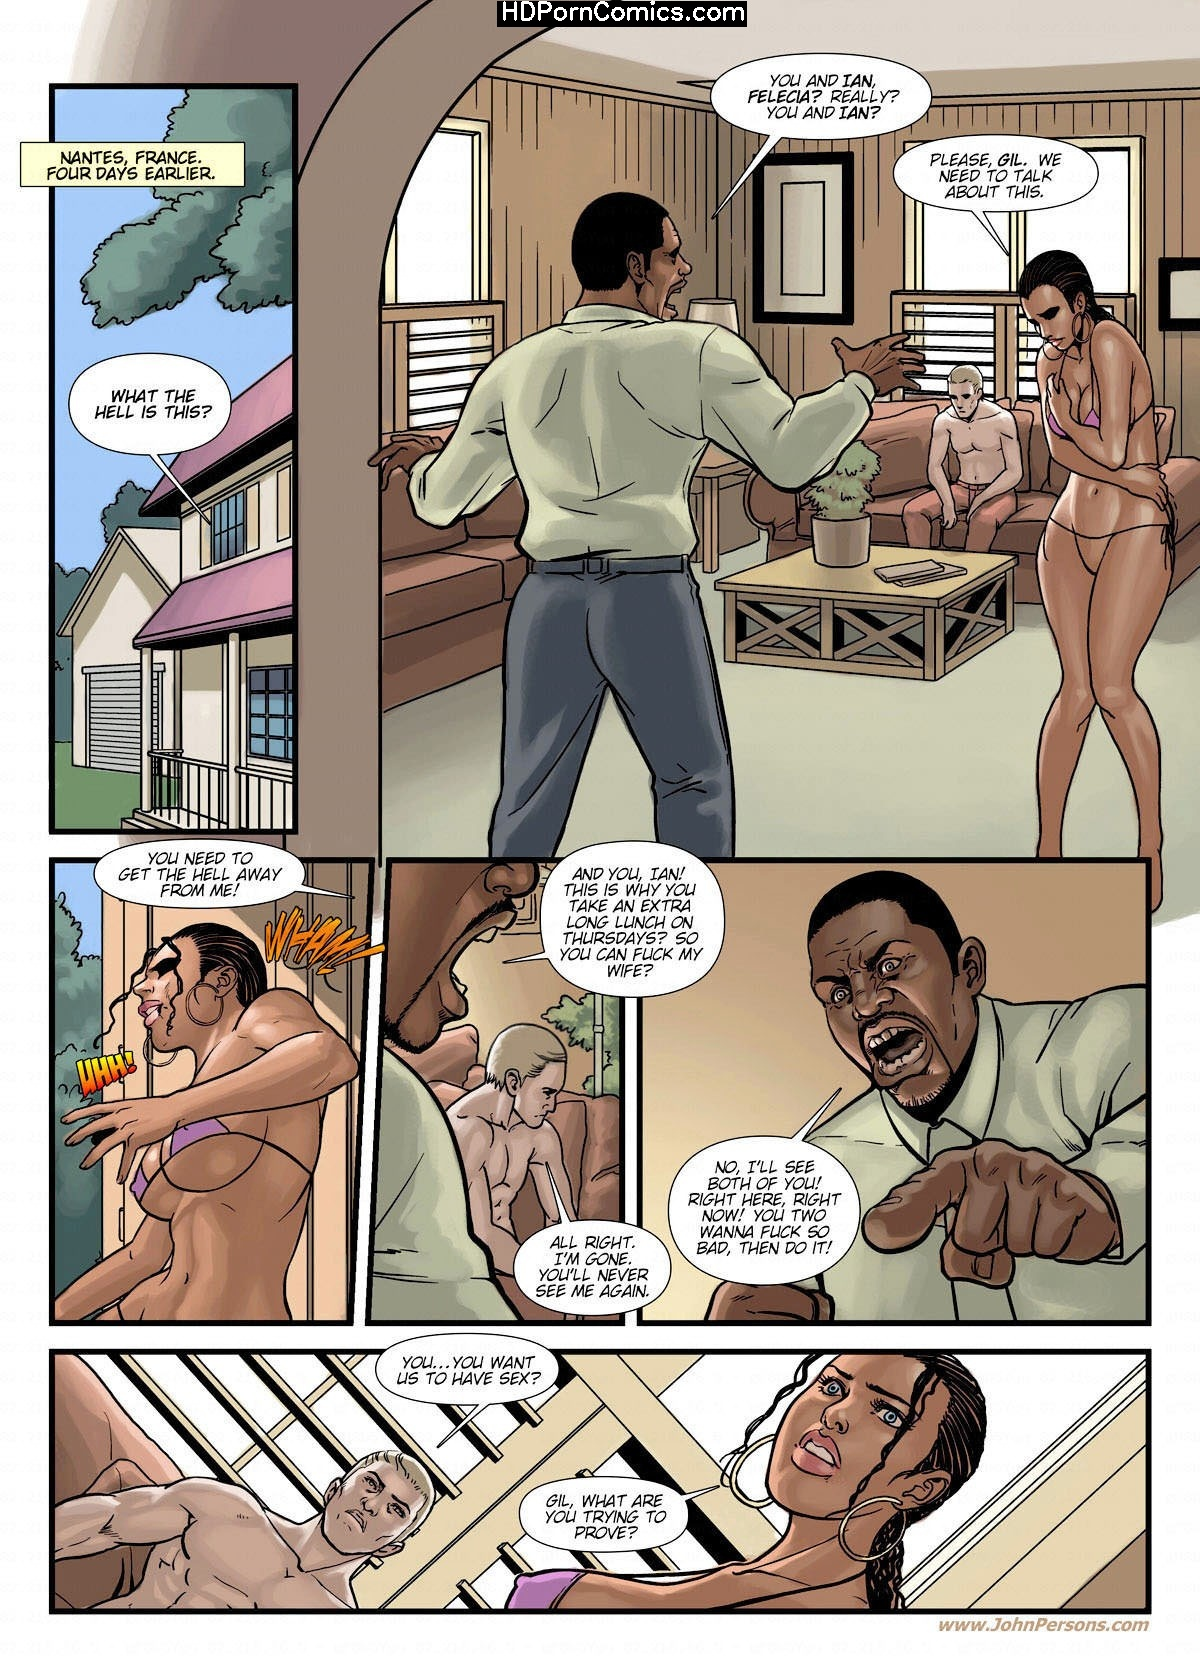 Comic hd porn hd porn